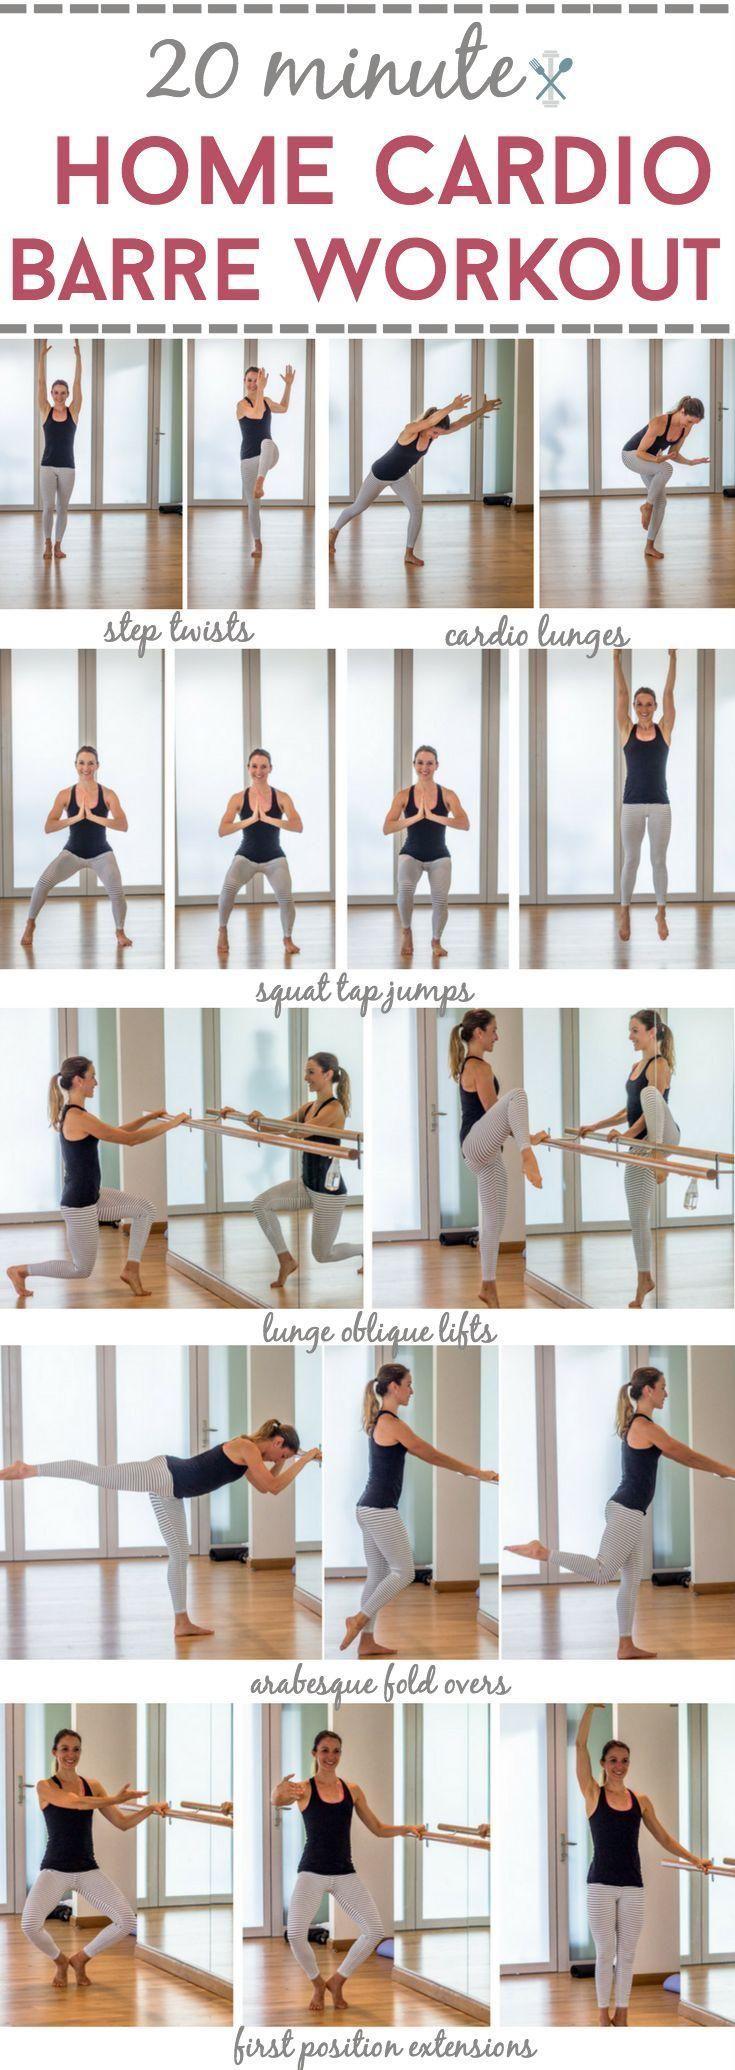 20 Minute Home Cardio Barre Workout  - Ballett - #Ballett #Barre #Cardio #Home #Minute #Workout #cardiobarre 20 Minute Home Cardio Barre Workout  - Ballett - #Ballett #Barre #Cardio #Home #Minute #Workout #cardiobarre 20 Minute Home Cardio Barre Workout  - Ballett - #Ballett #Barre #Cardio #Home #Minute #Workout #cardiobarre 20 Minute Home Cardio Barre Workout  - Ballett - #Ballett #Barre #Cardio #Home #Minute #Workout #cardiobarre